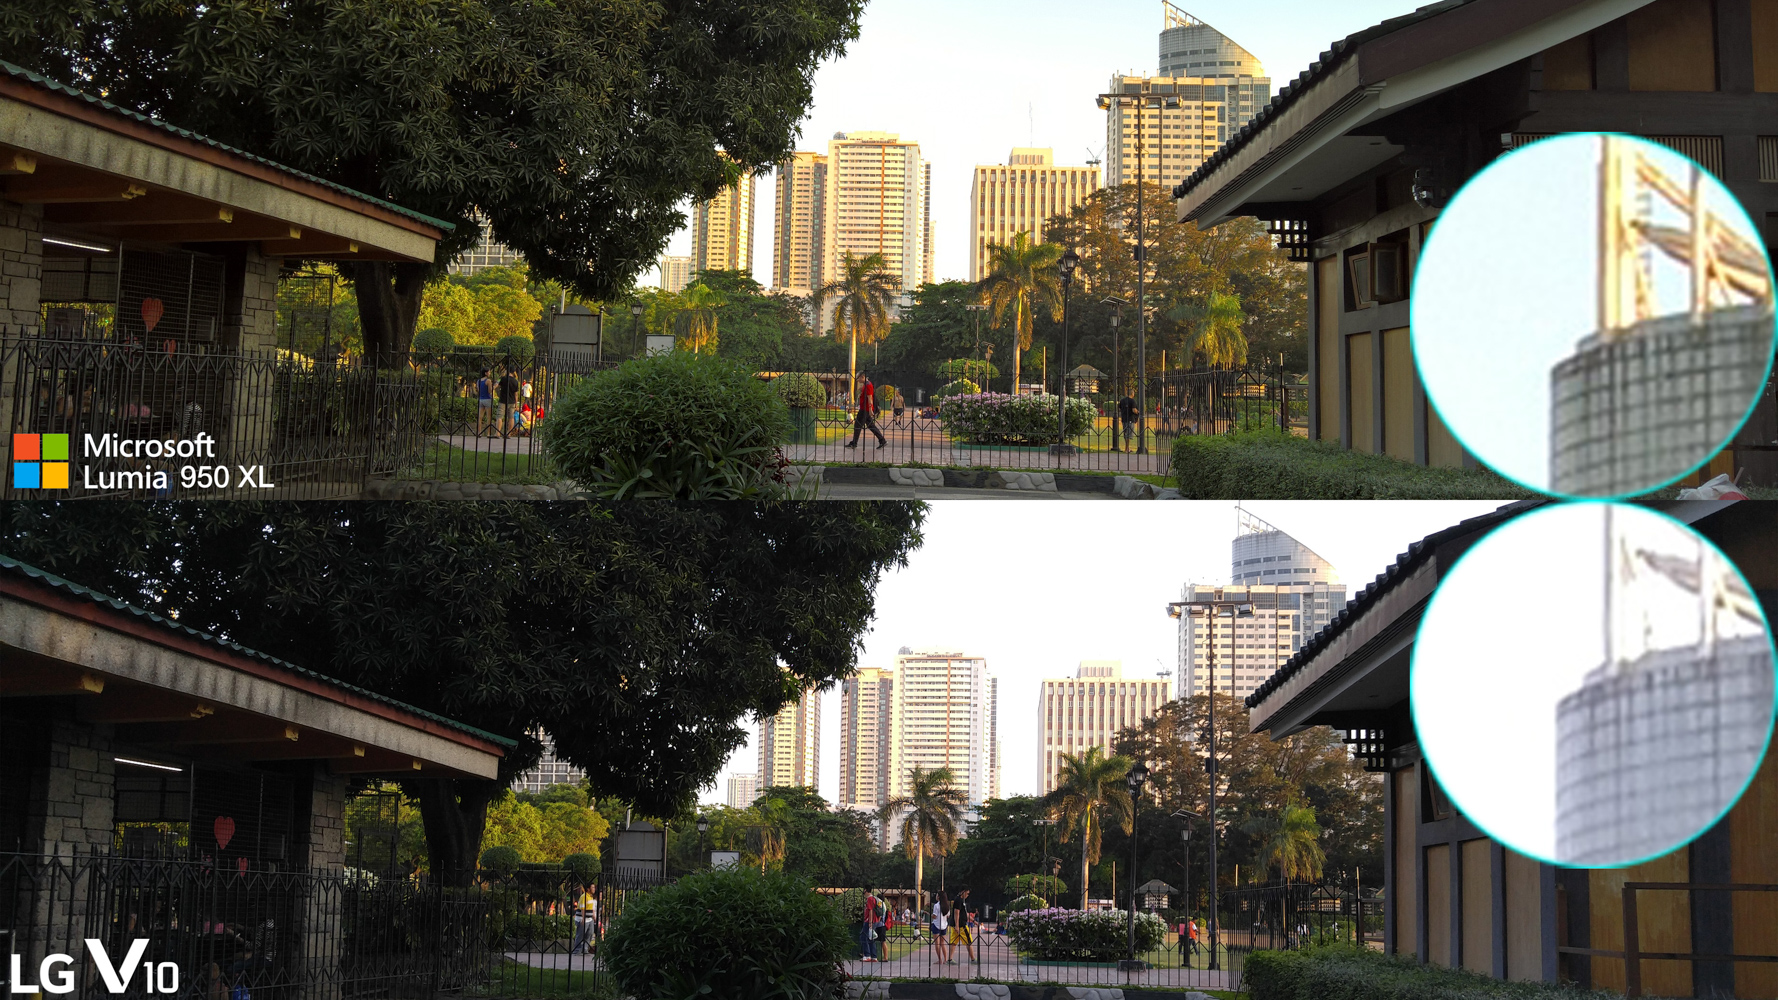 lg v10 vs lumia 950 xl camera review 12 of 15